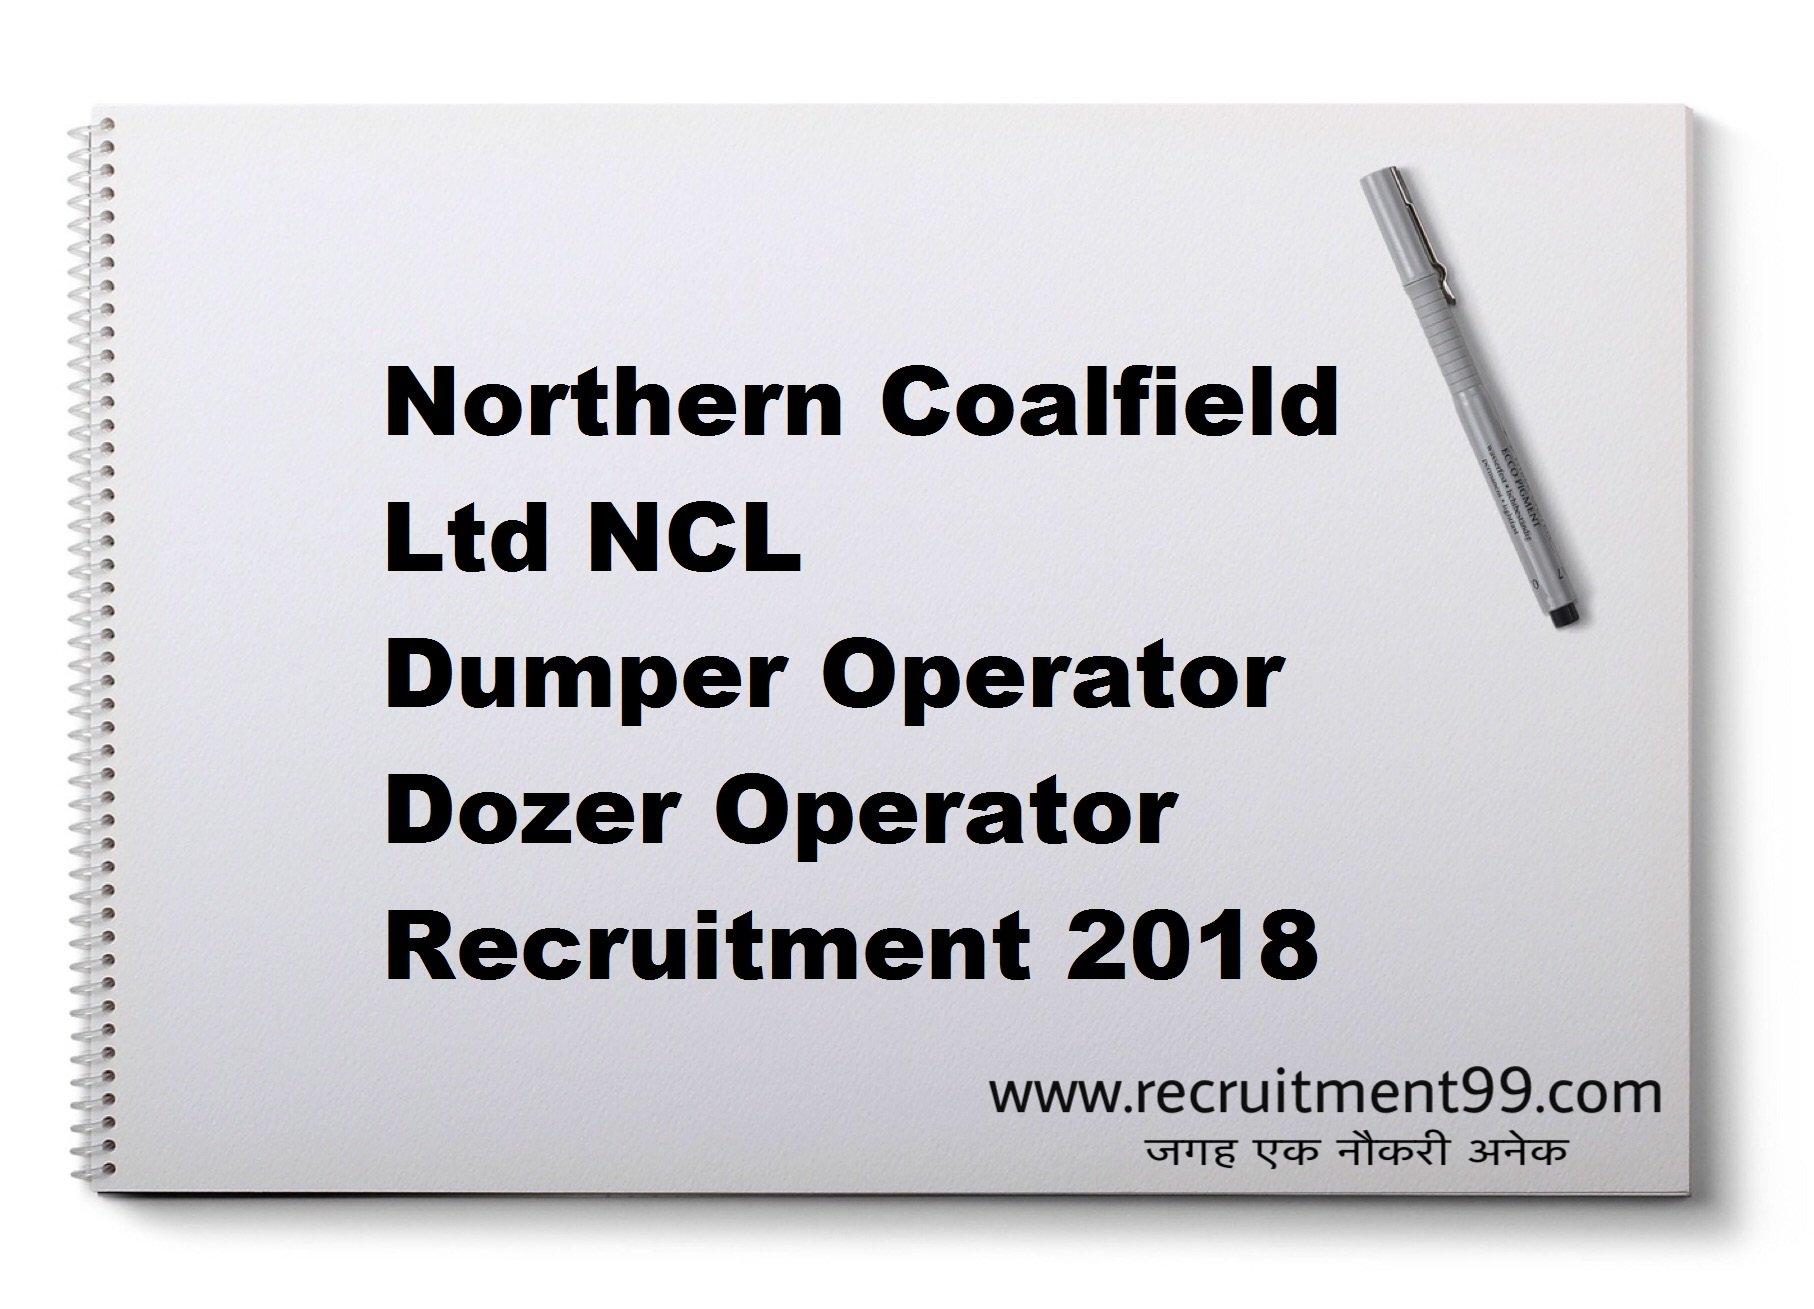 Northern Coalfield Ltd NCL Dumper Operator Dozer Operator Recruitment Admit Card Result 2018